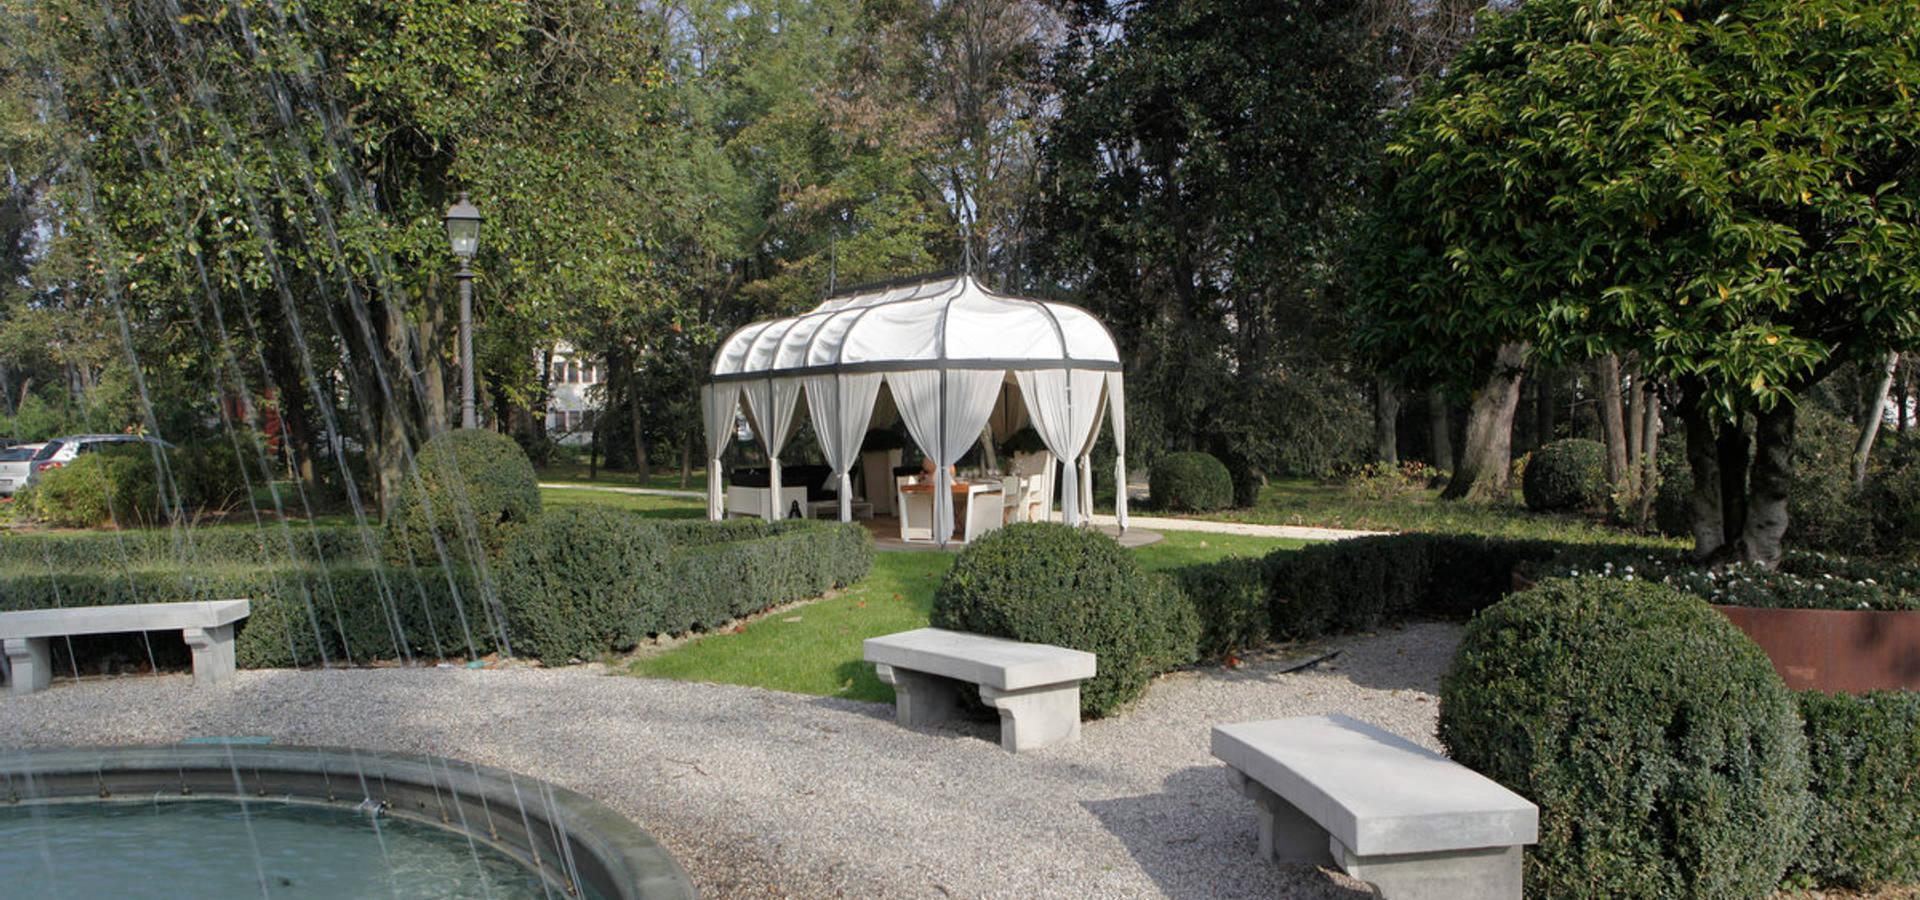 Odue Modena – Concept Store